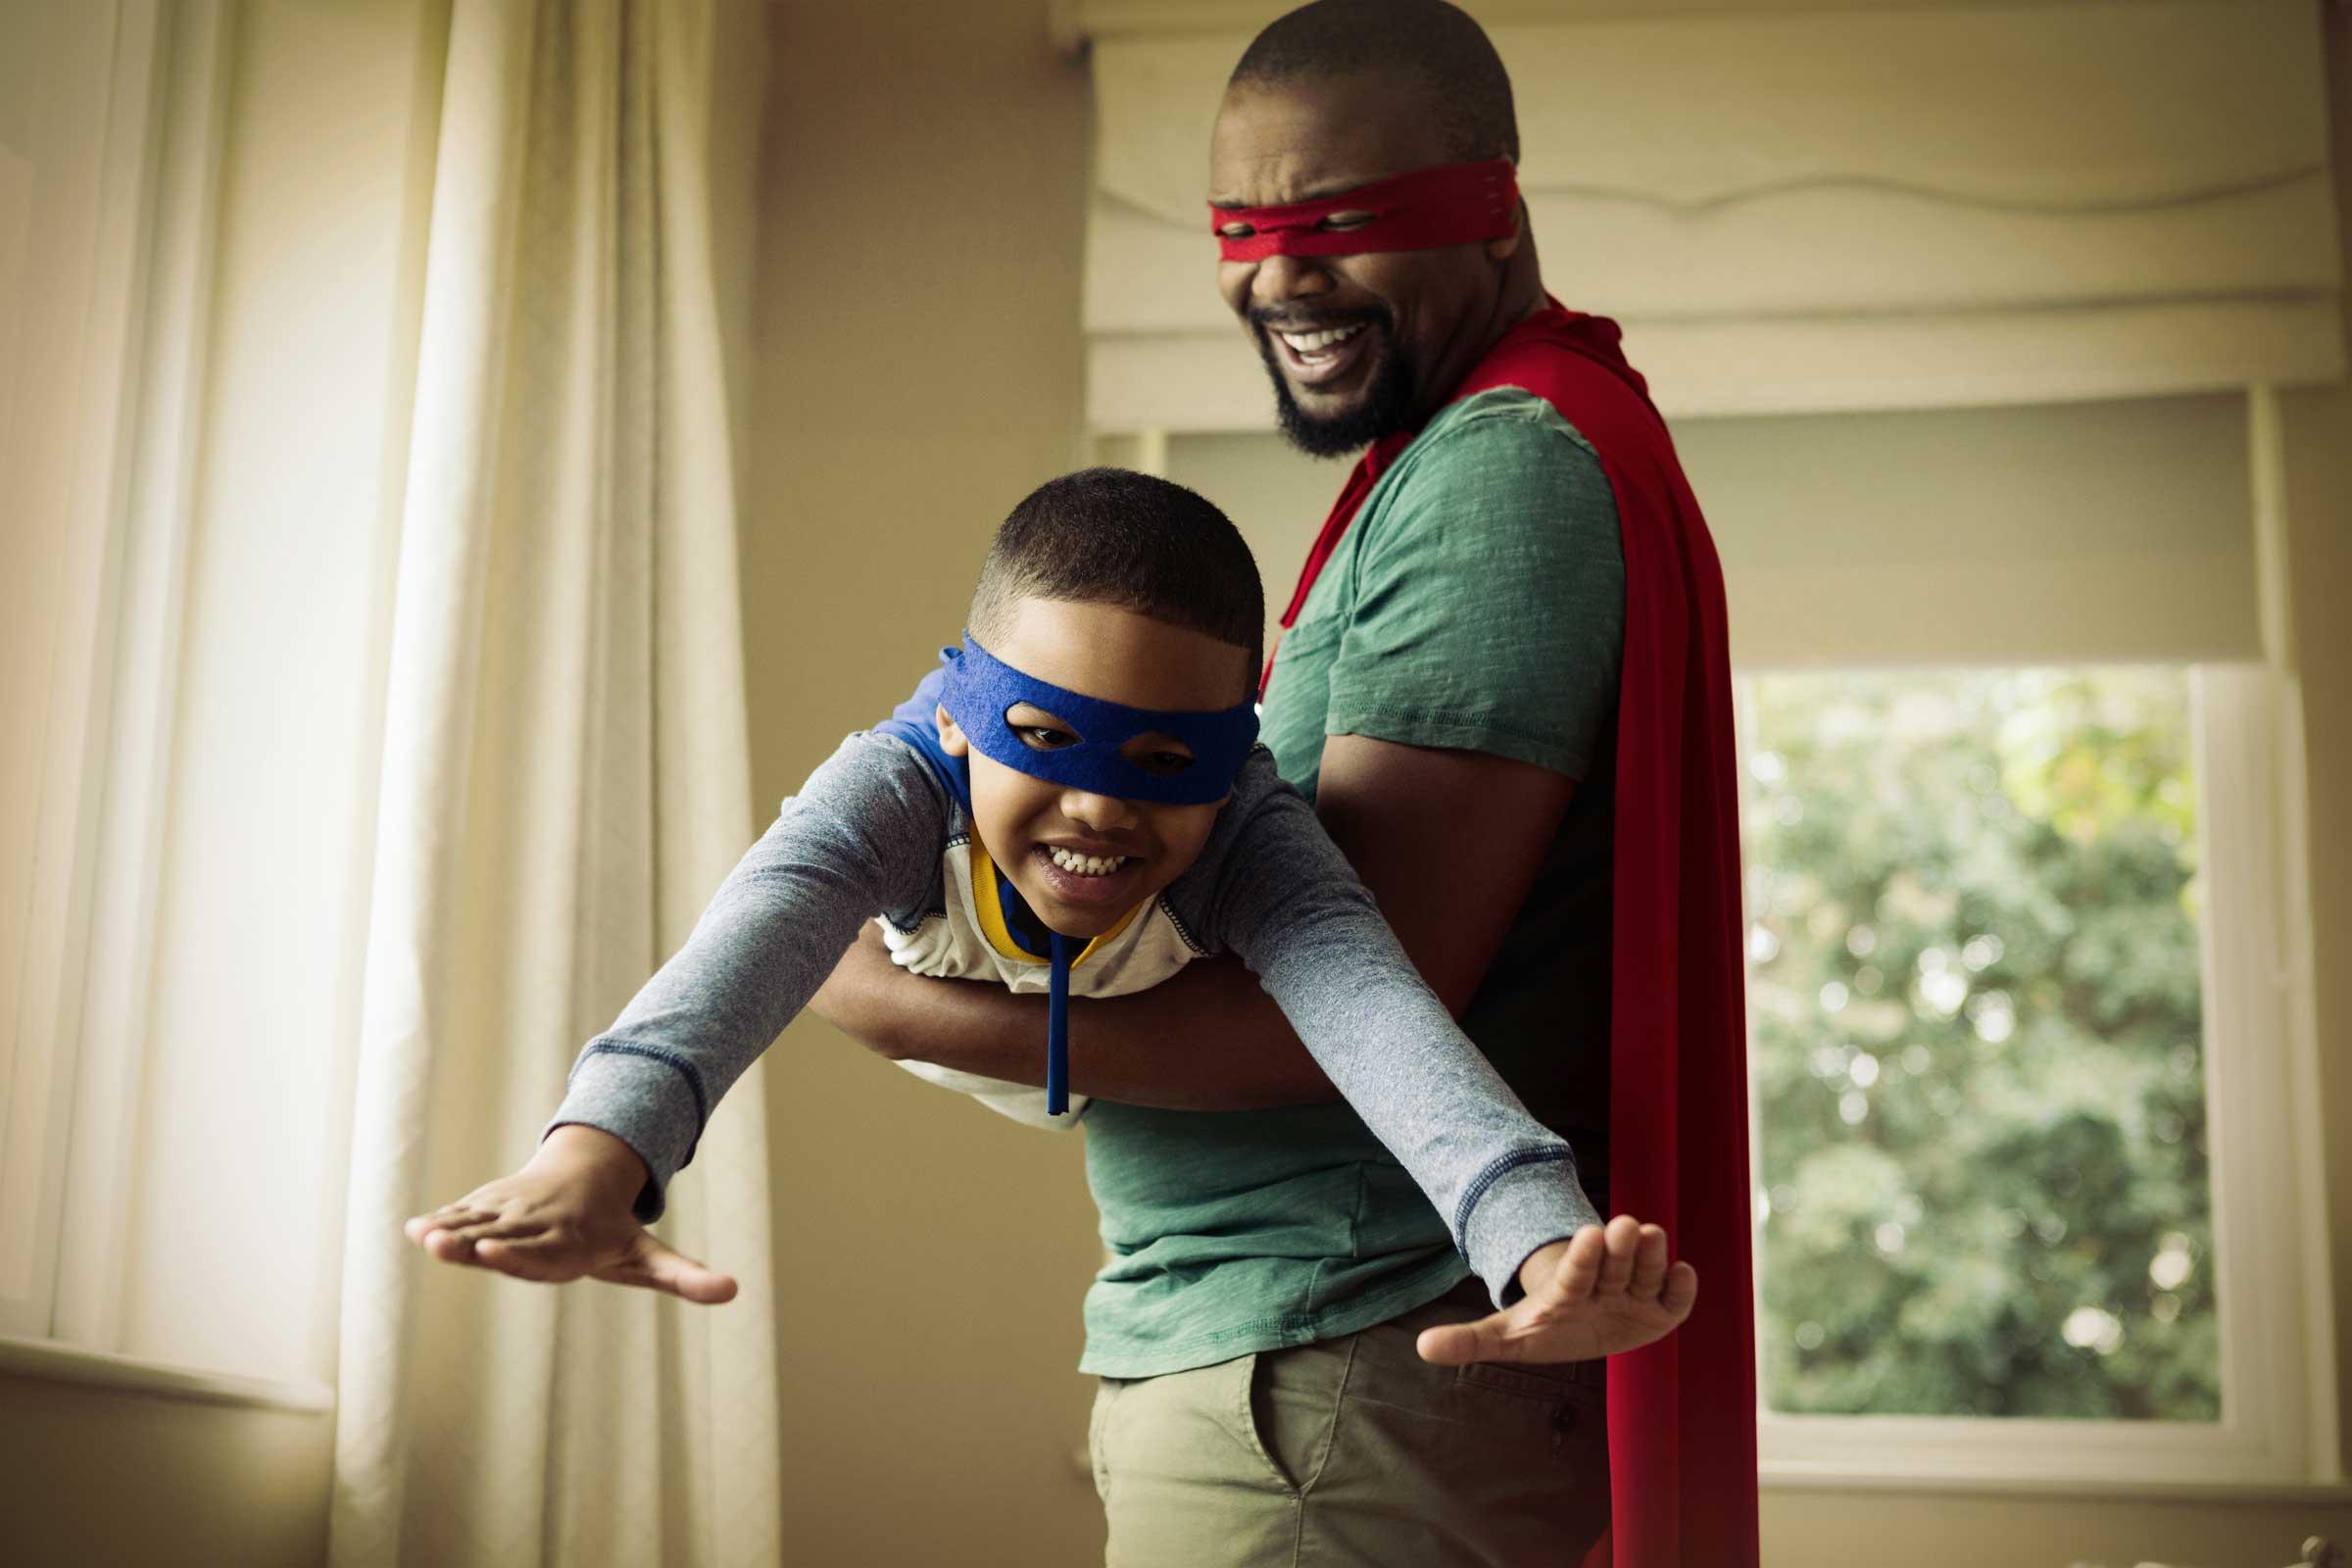 Why is the Superhero program important?